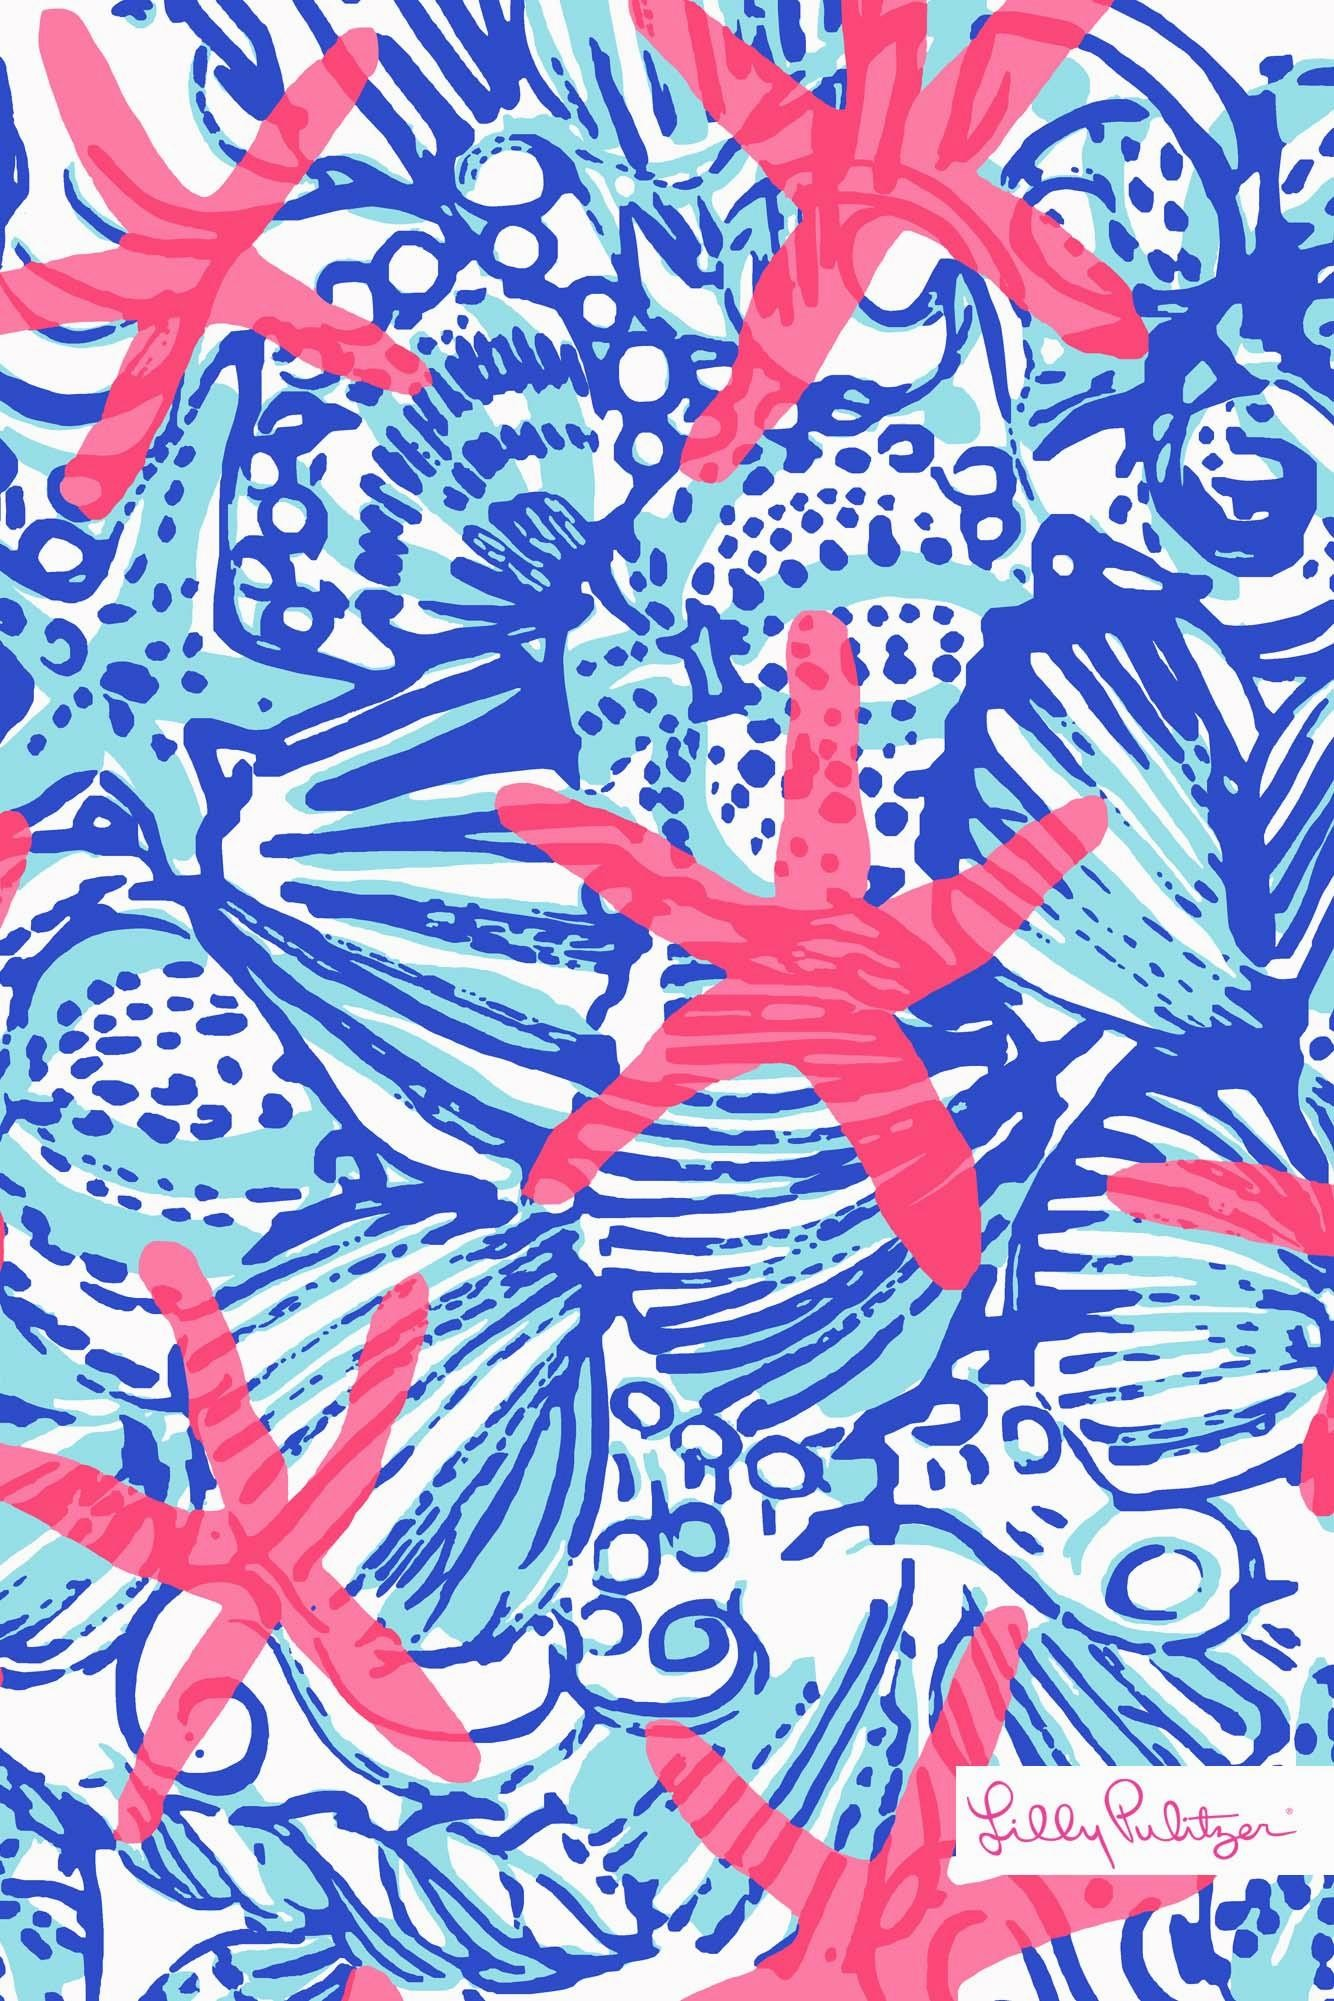 Lilly-Pulitzer-SummerSheSheShells-iphone-wallpaper-wallpaper-2